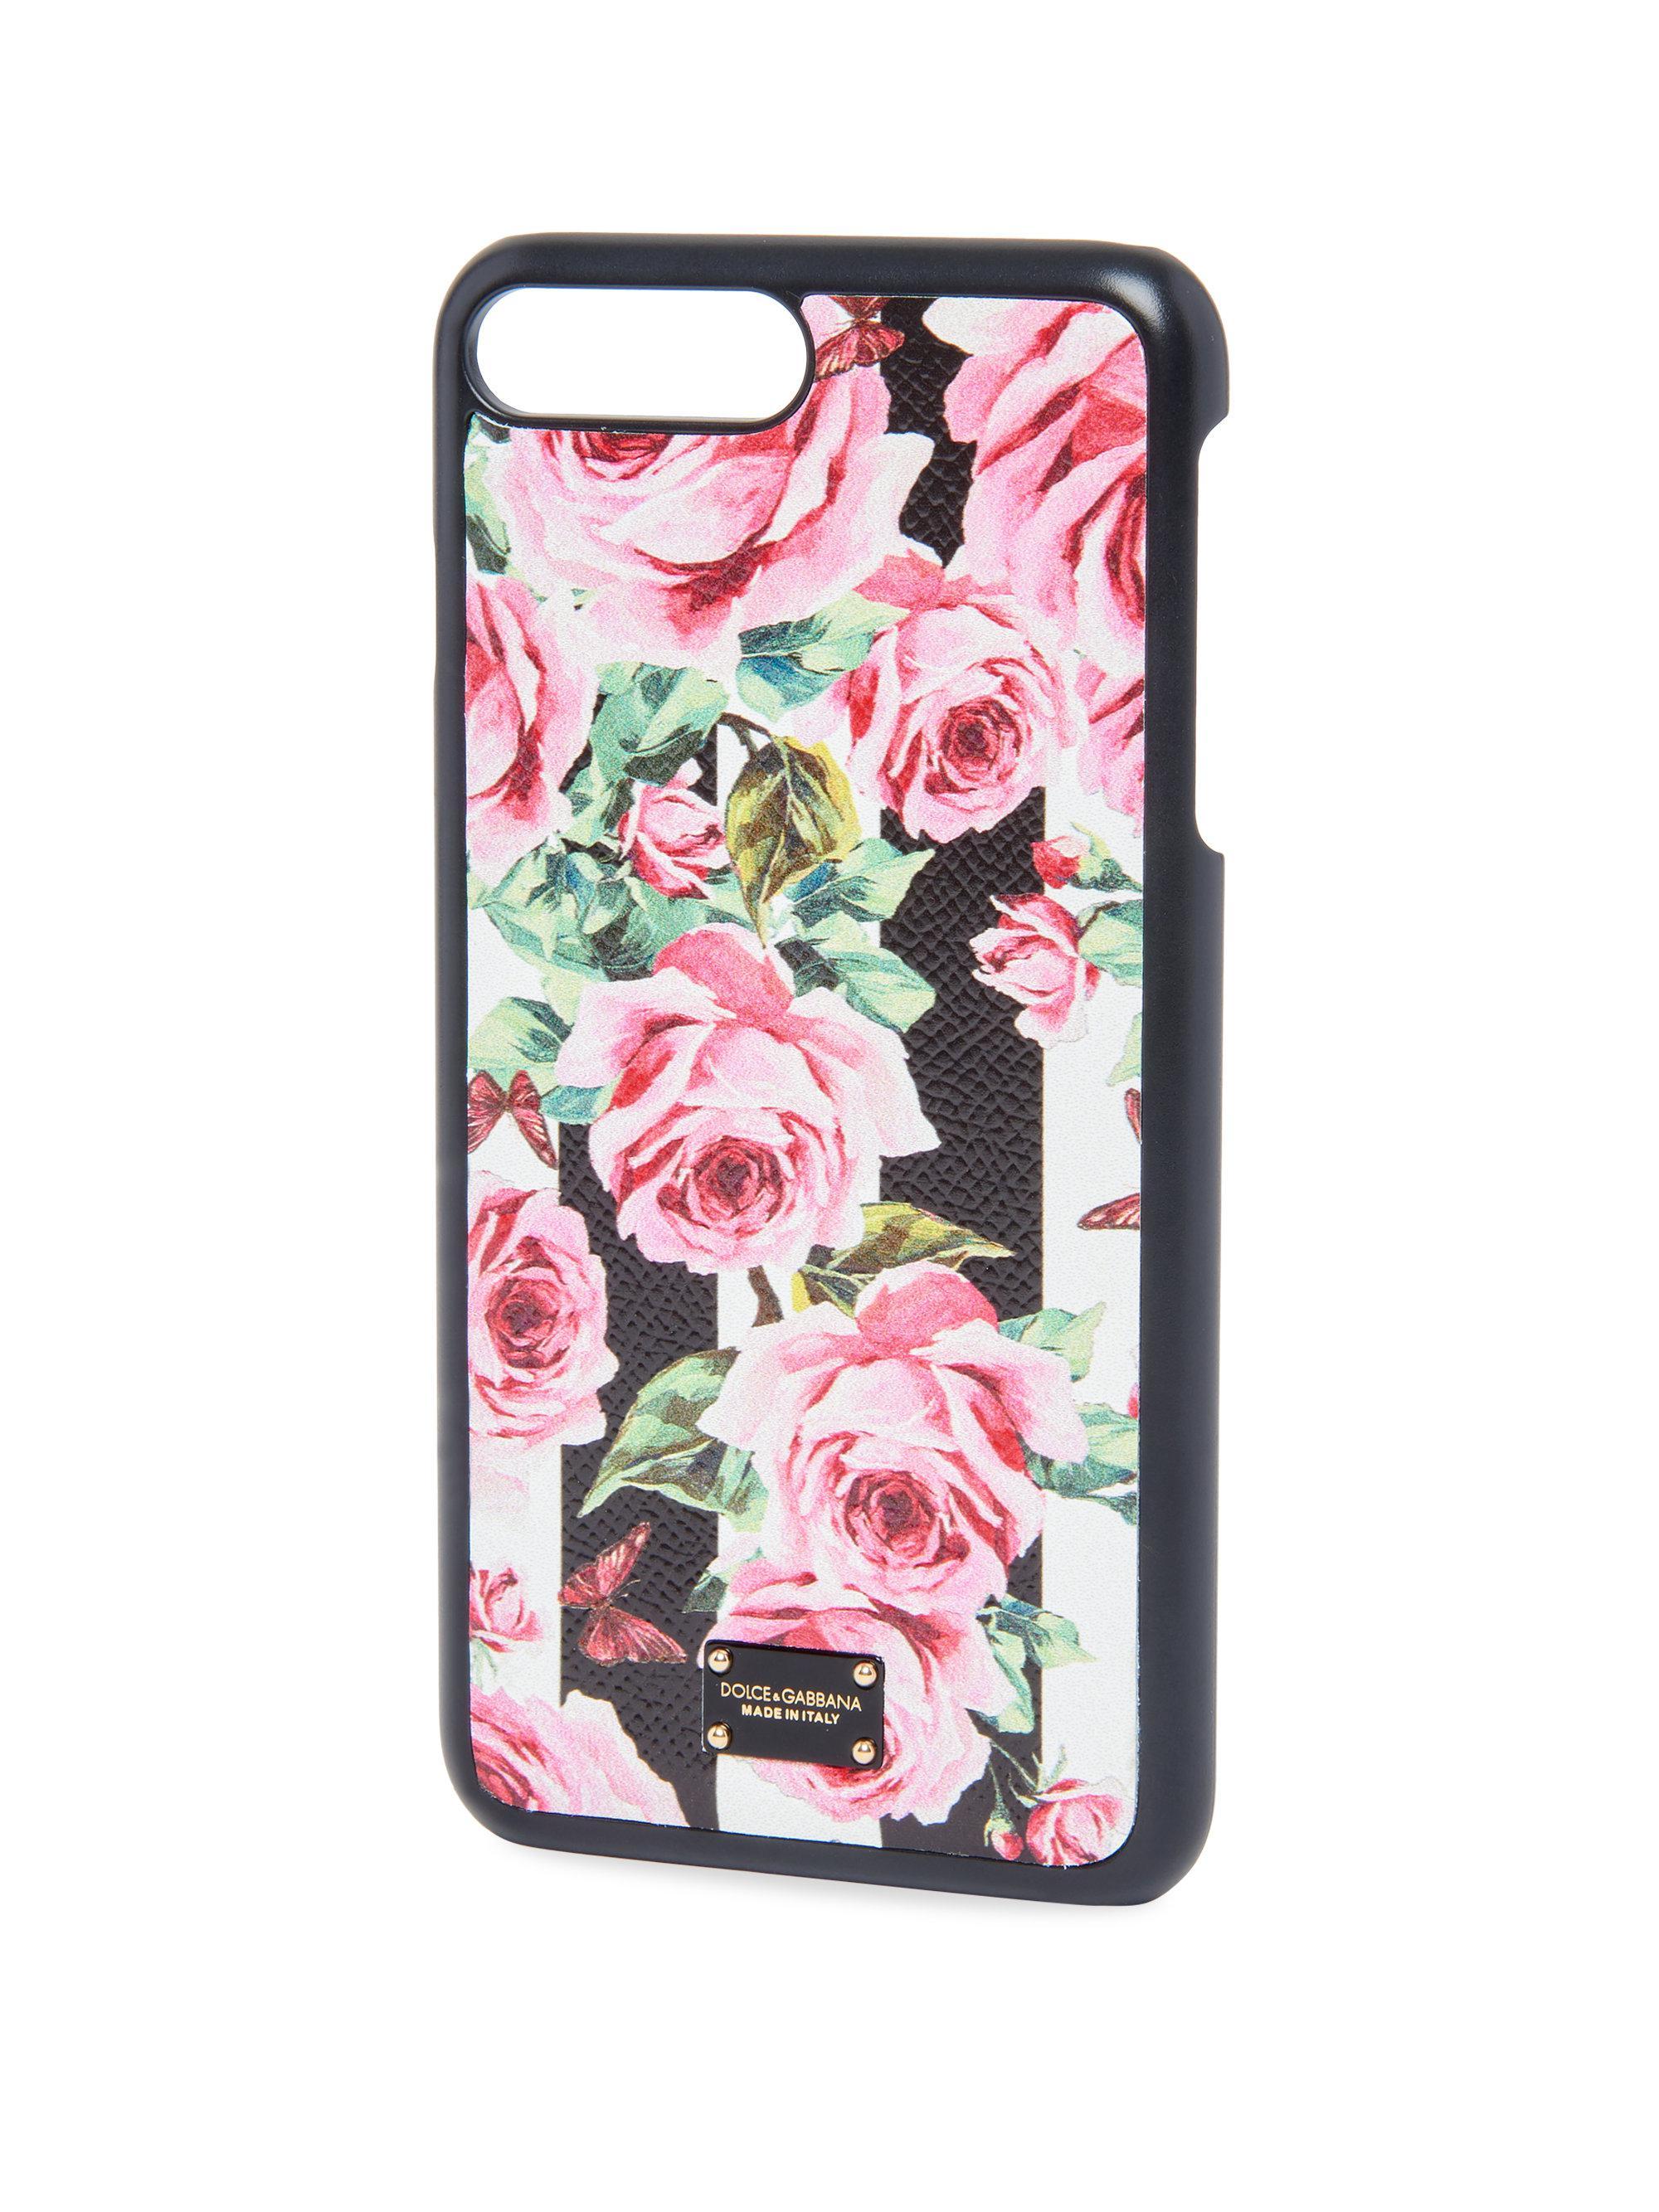 Multicolor Rose iPhone 7 Plus Case Dolce & Gabbana UnSzN